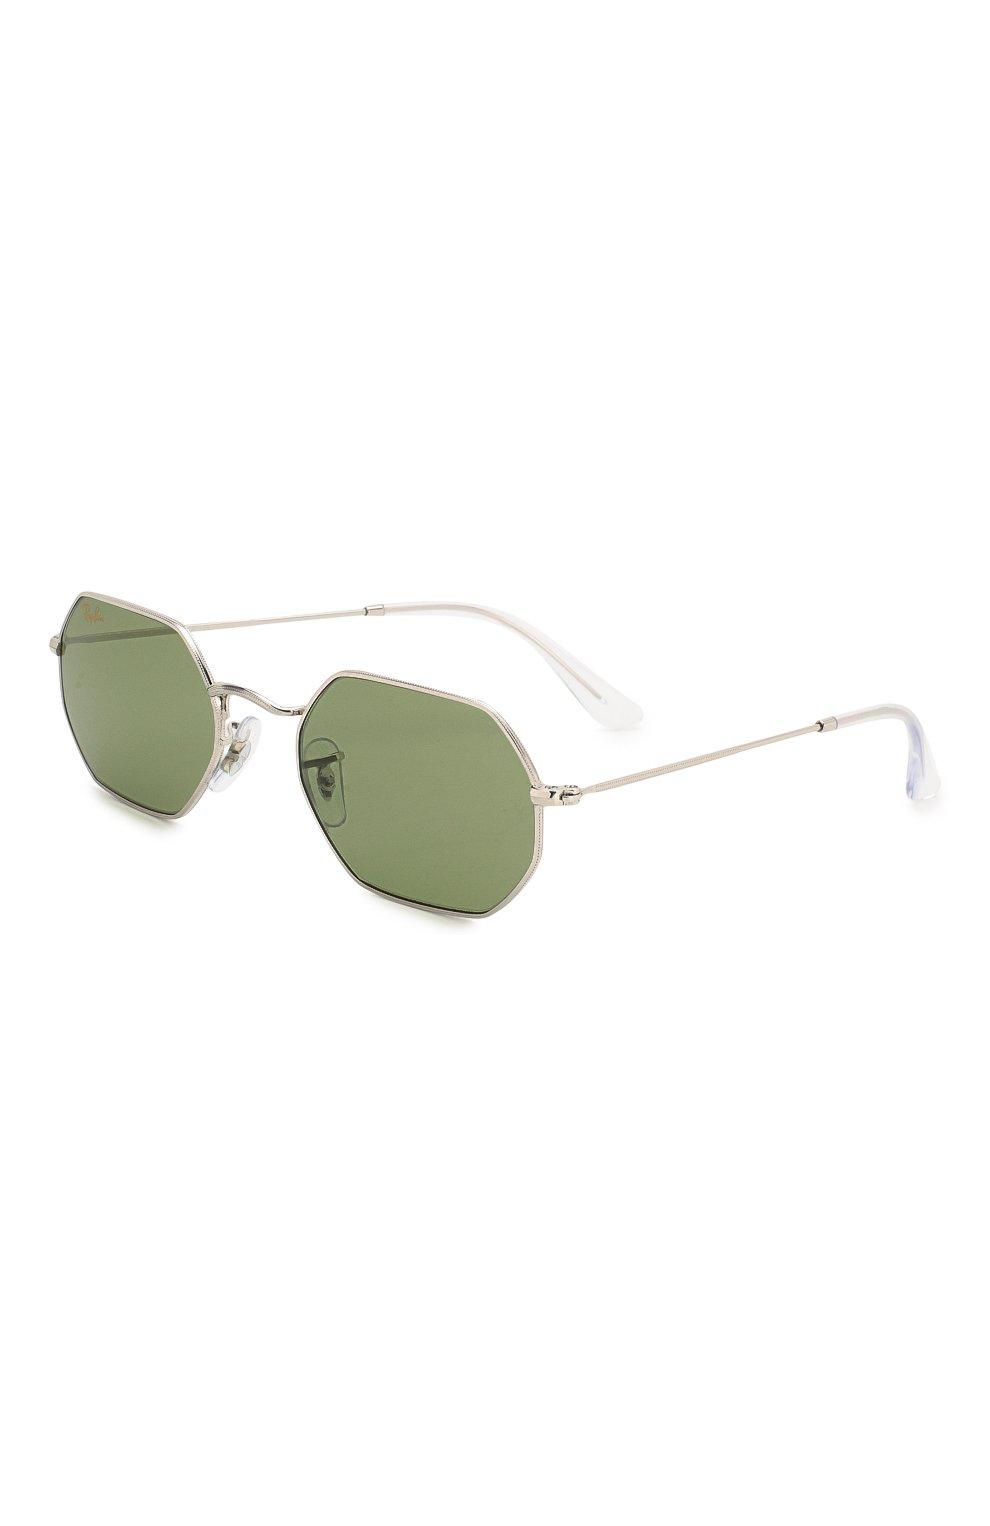 Женские солнцезащитные очки RAY-BAN зеленого цвета, арт. 3556-91984E   Фото 1